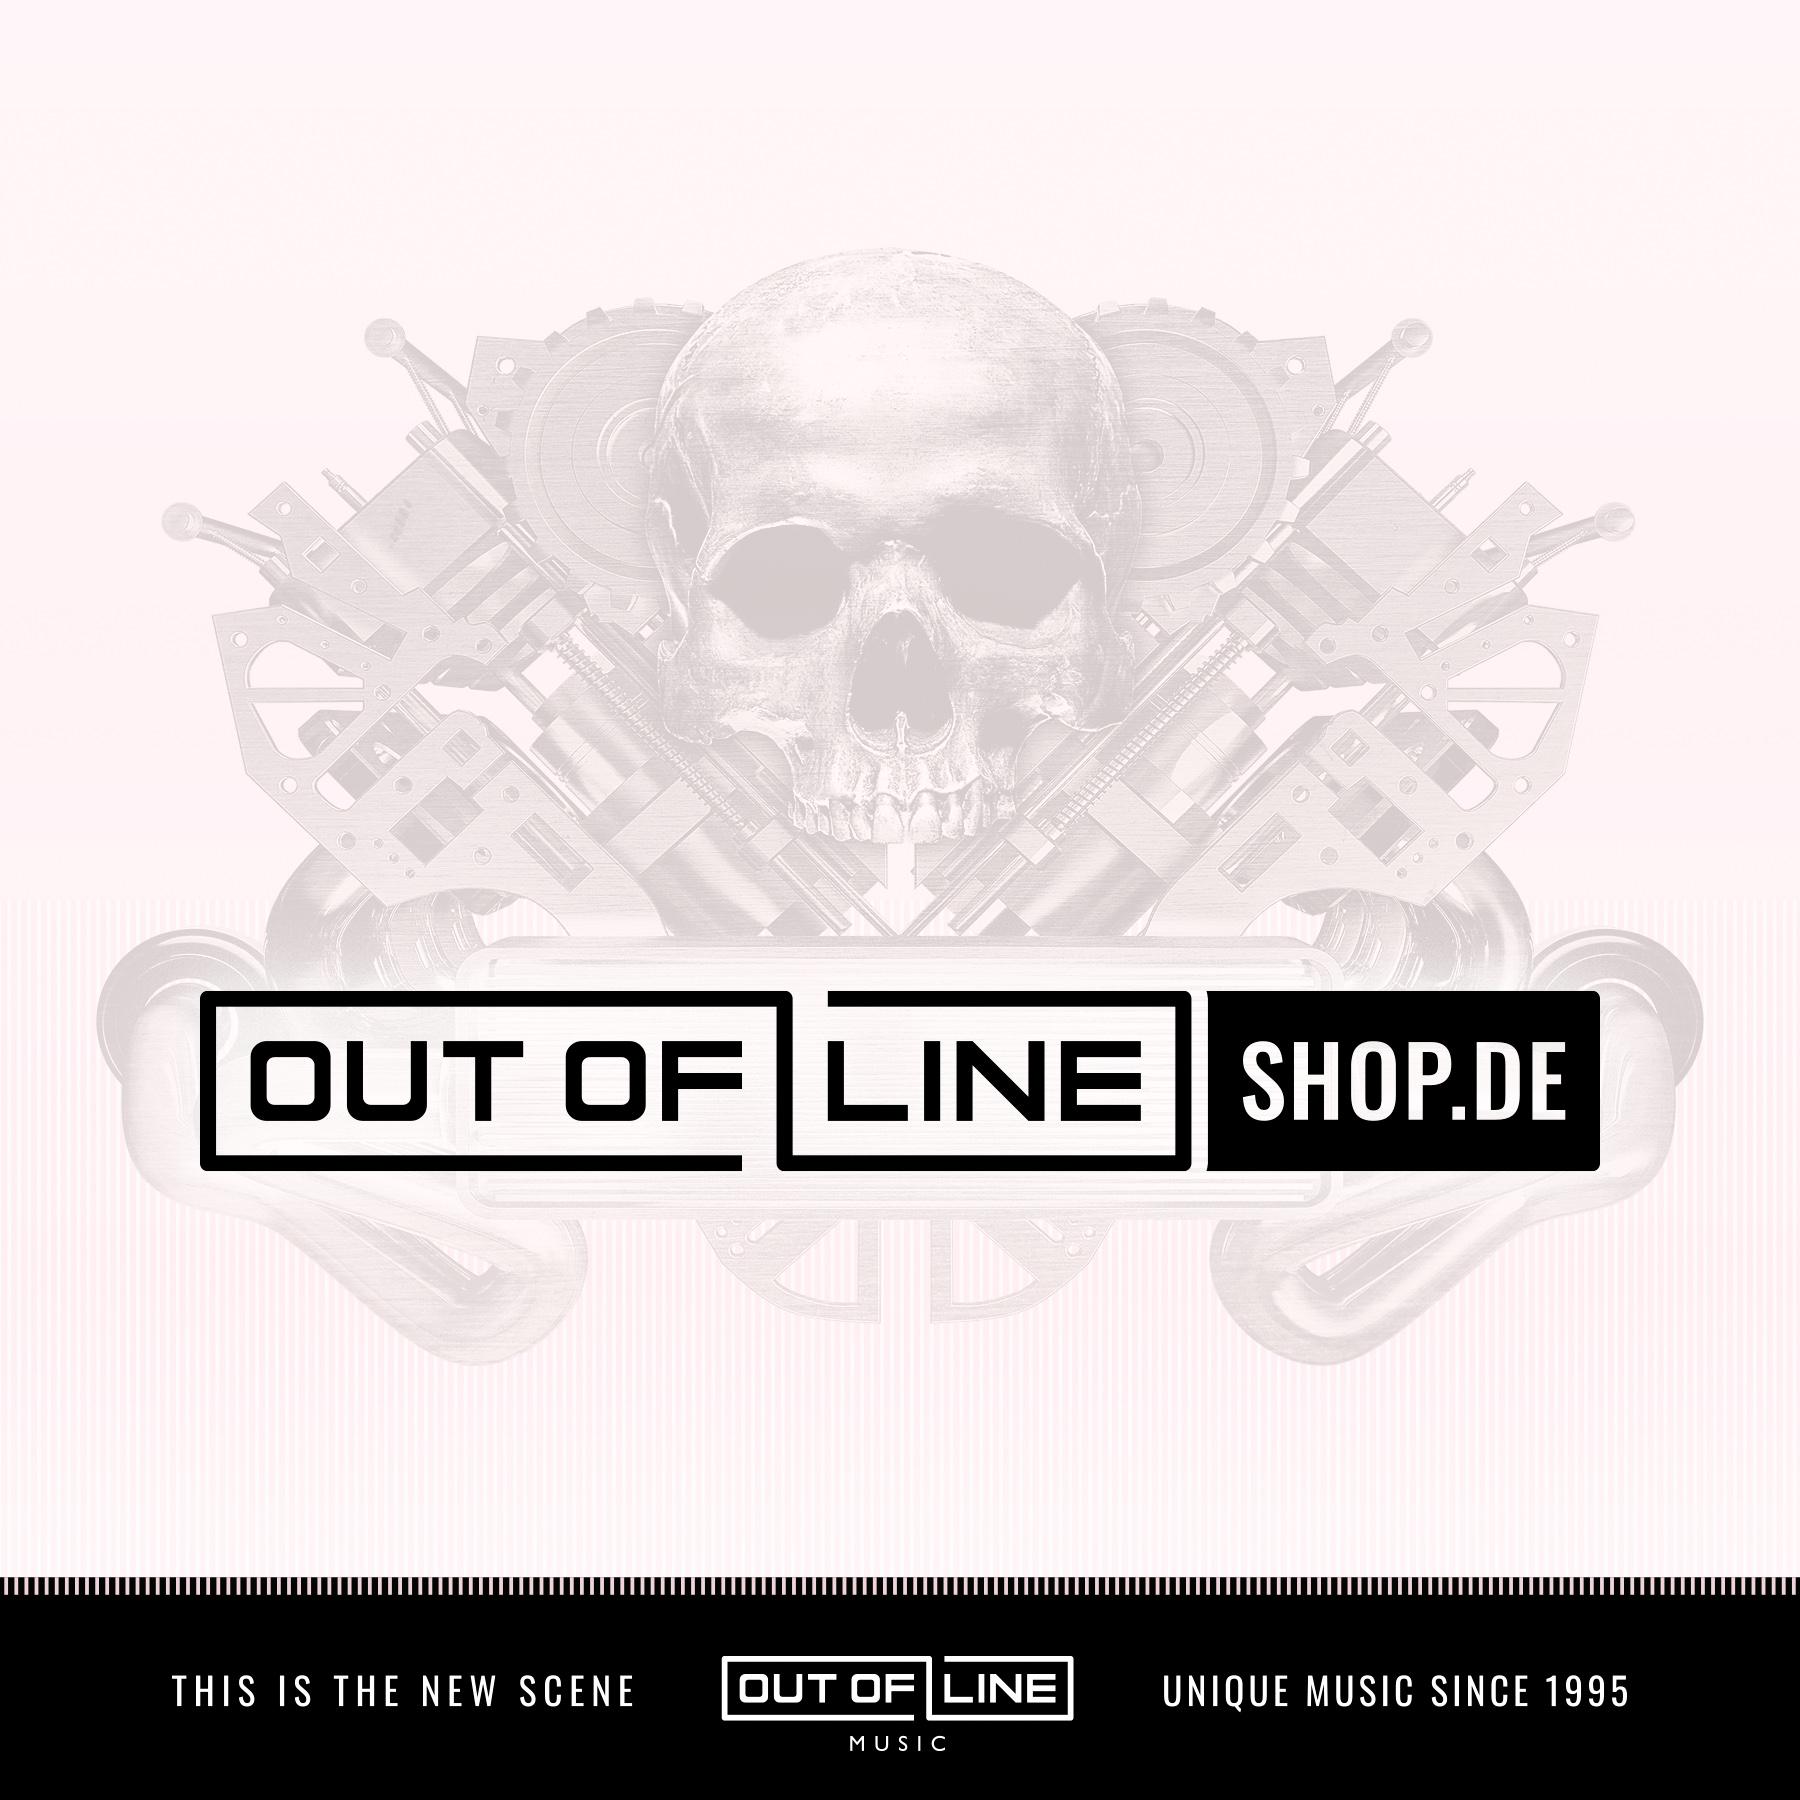 Blutengel - Ich bin dein Gott - Girlie - Girlie Shirt